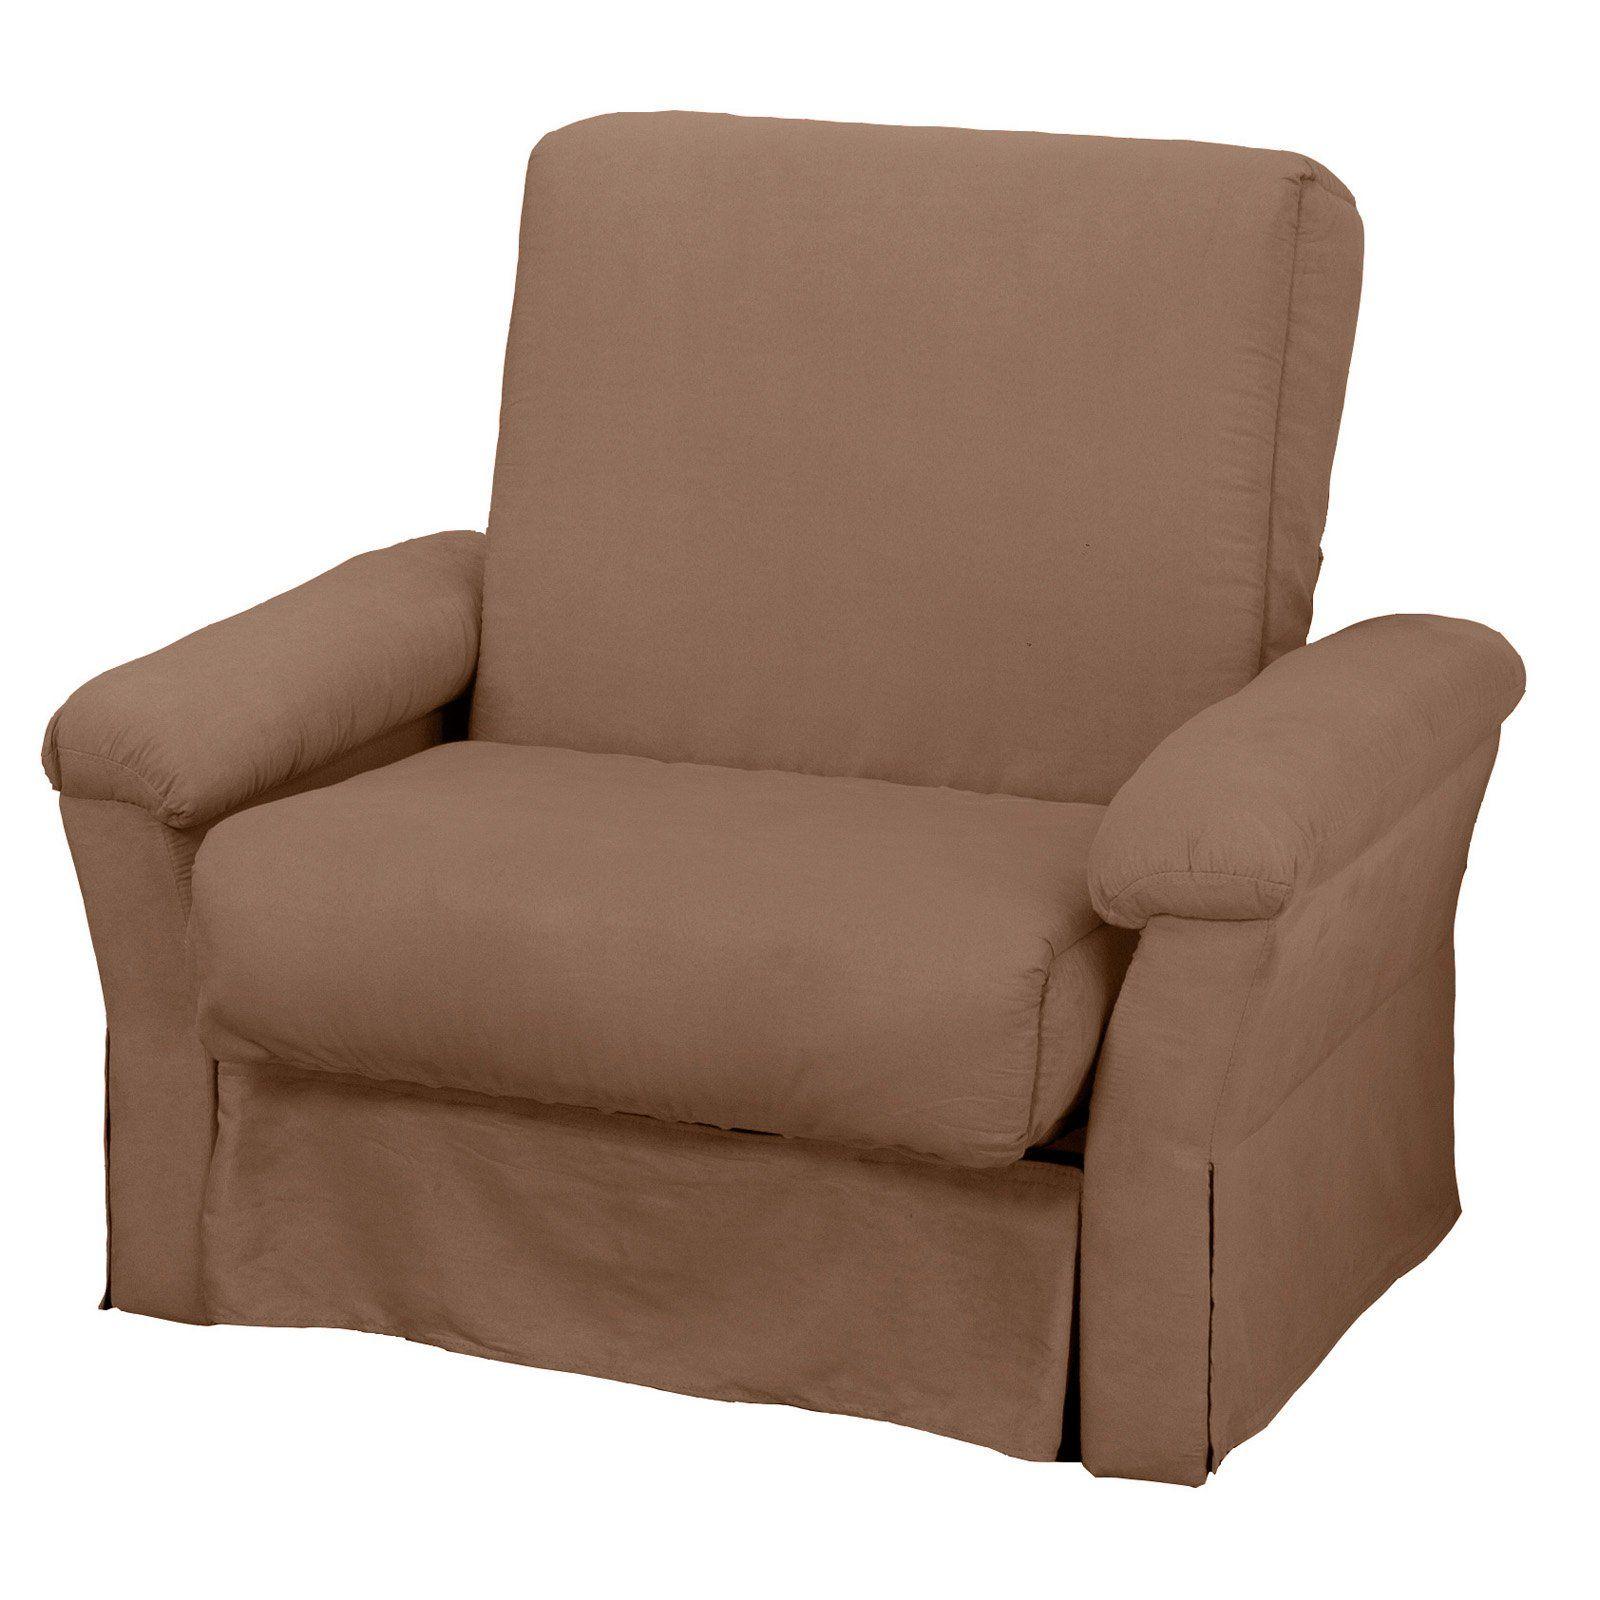 Prime Epic Home Furnishings Sit Sleep Pillow Top Convertible Dailytribune Chair Design For Home Dailytribuneorg